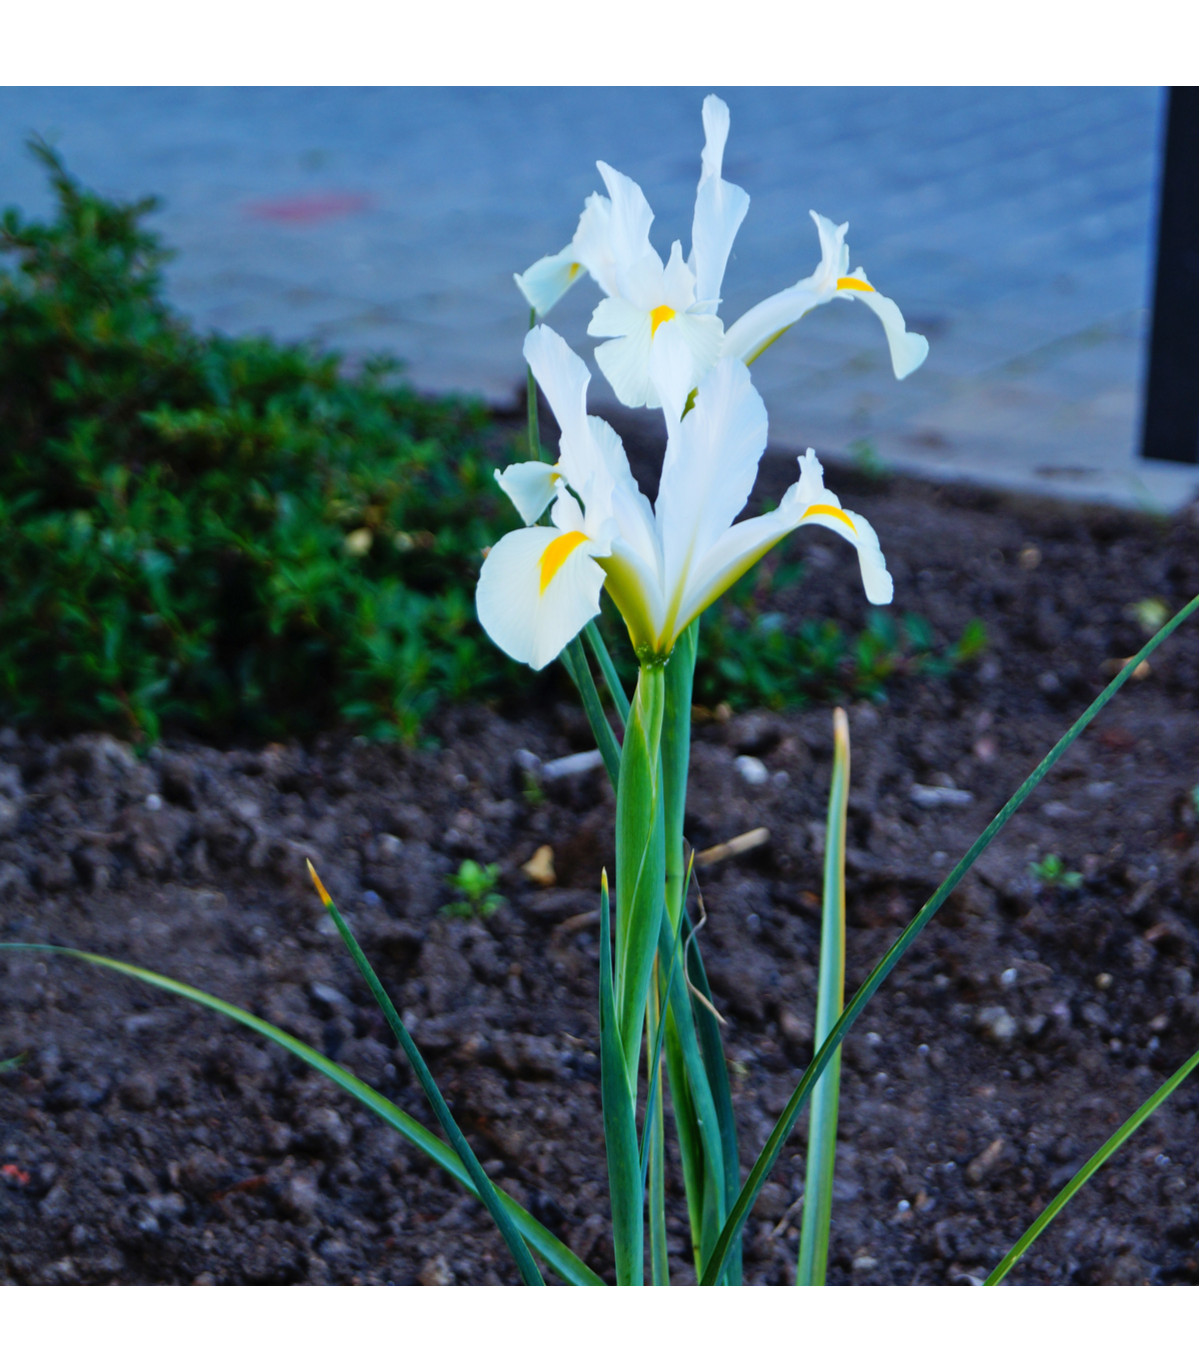 Kosatec White Excelsior - Iris - cibule kosatců - 3 ks